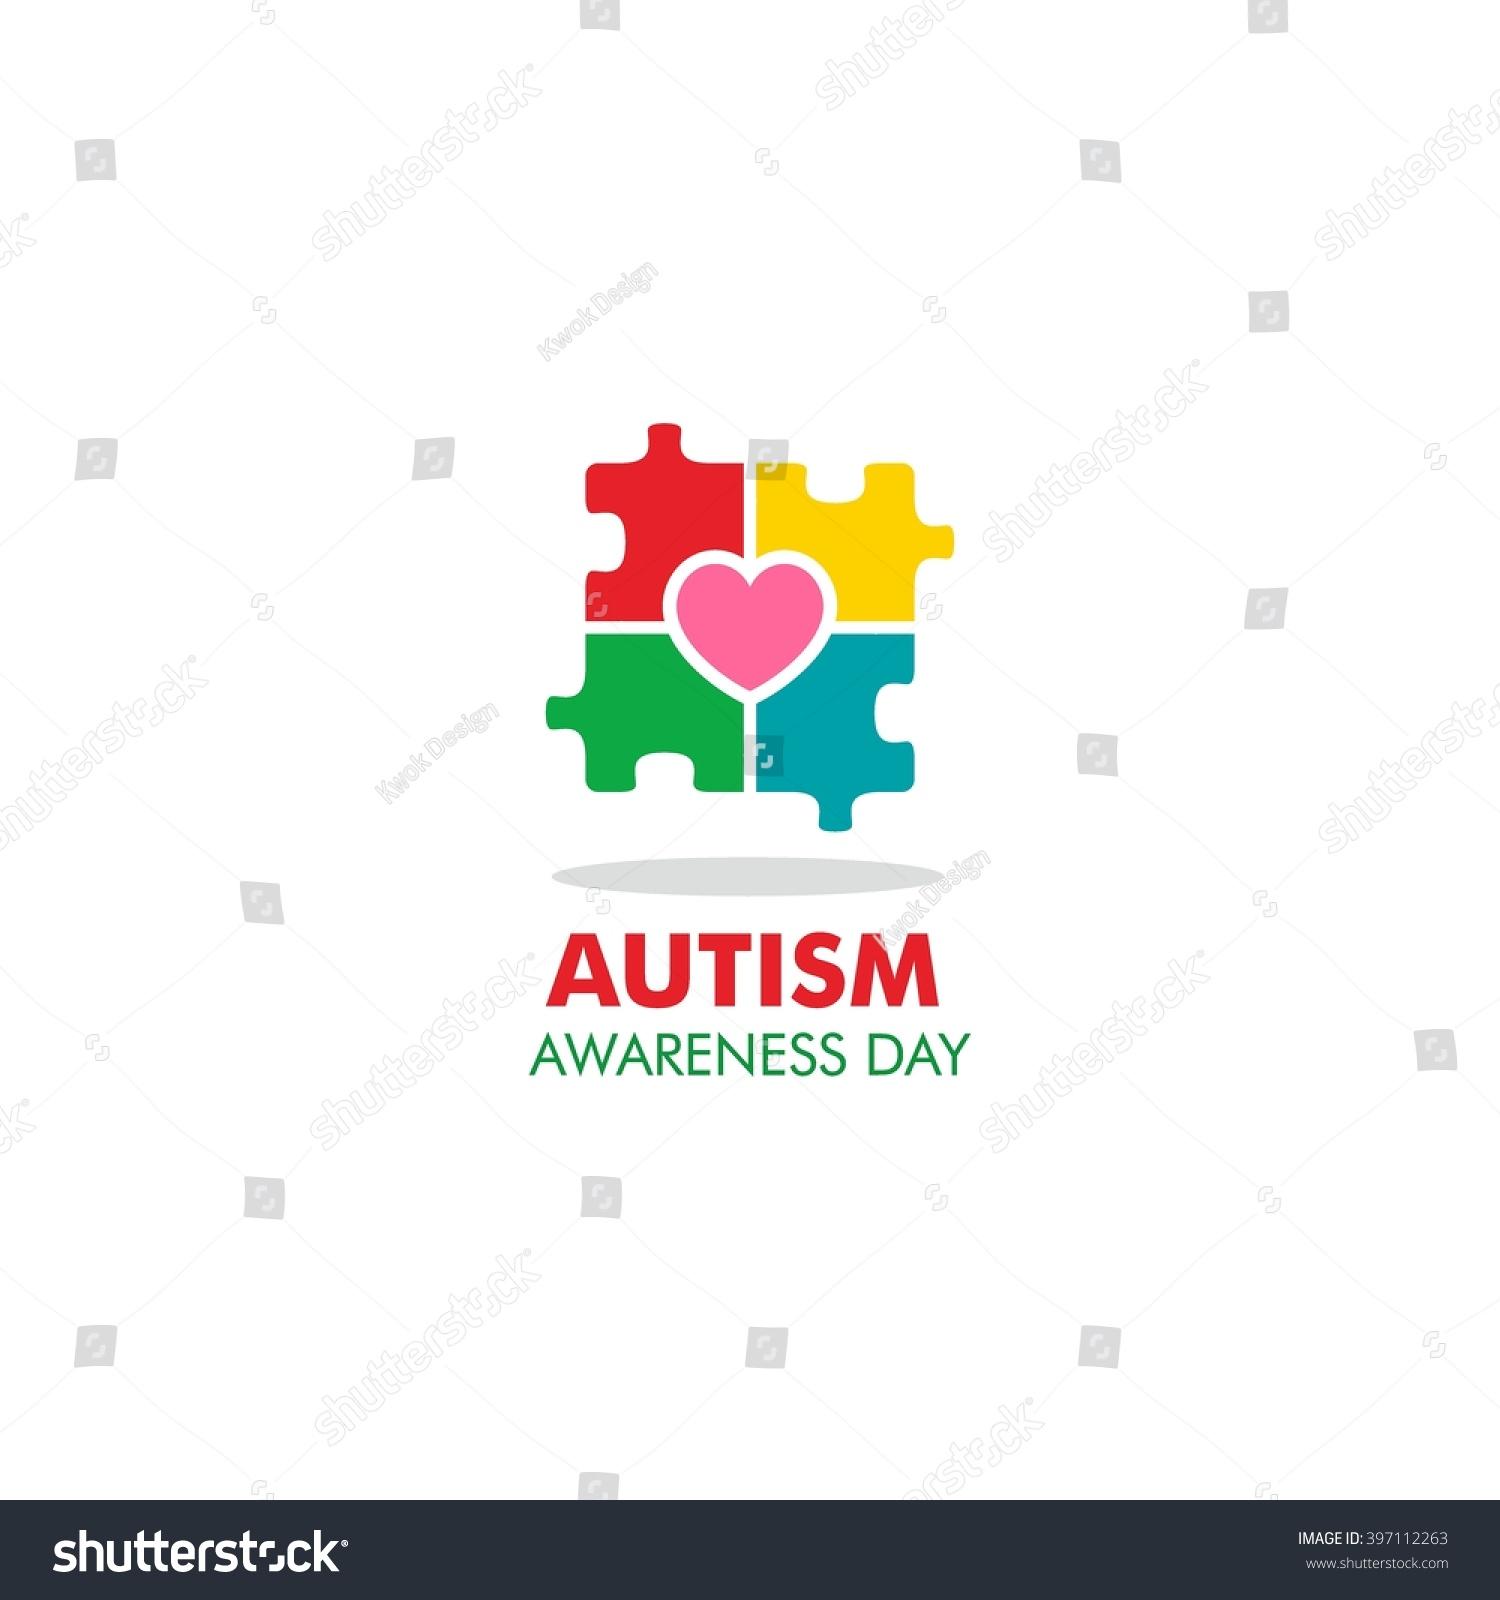 World autism awareness day logo design stock vector 397112263 world autism awareness day logo design template vector illustration colorful puzzles symbol biocorpaavc